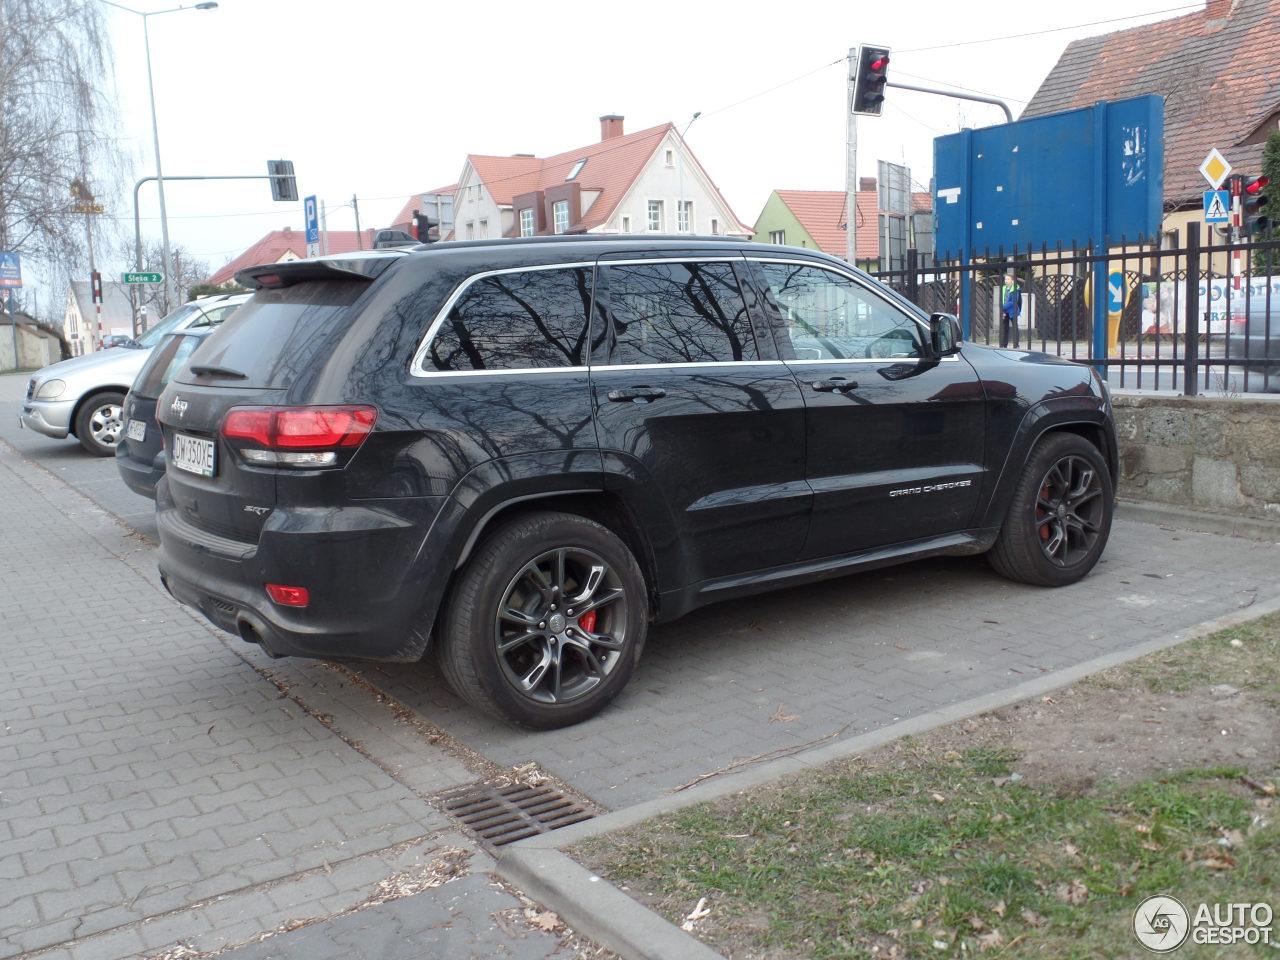 2015 jeep srt8 in dubai 2017 2018 best cars reviews. Black Bedroom Furniture Sets. Home Design Ideas